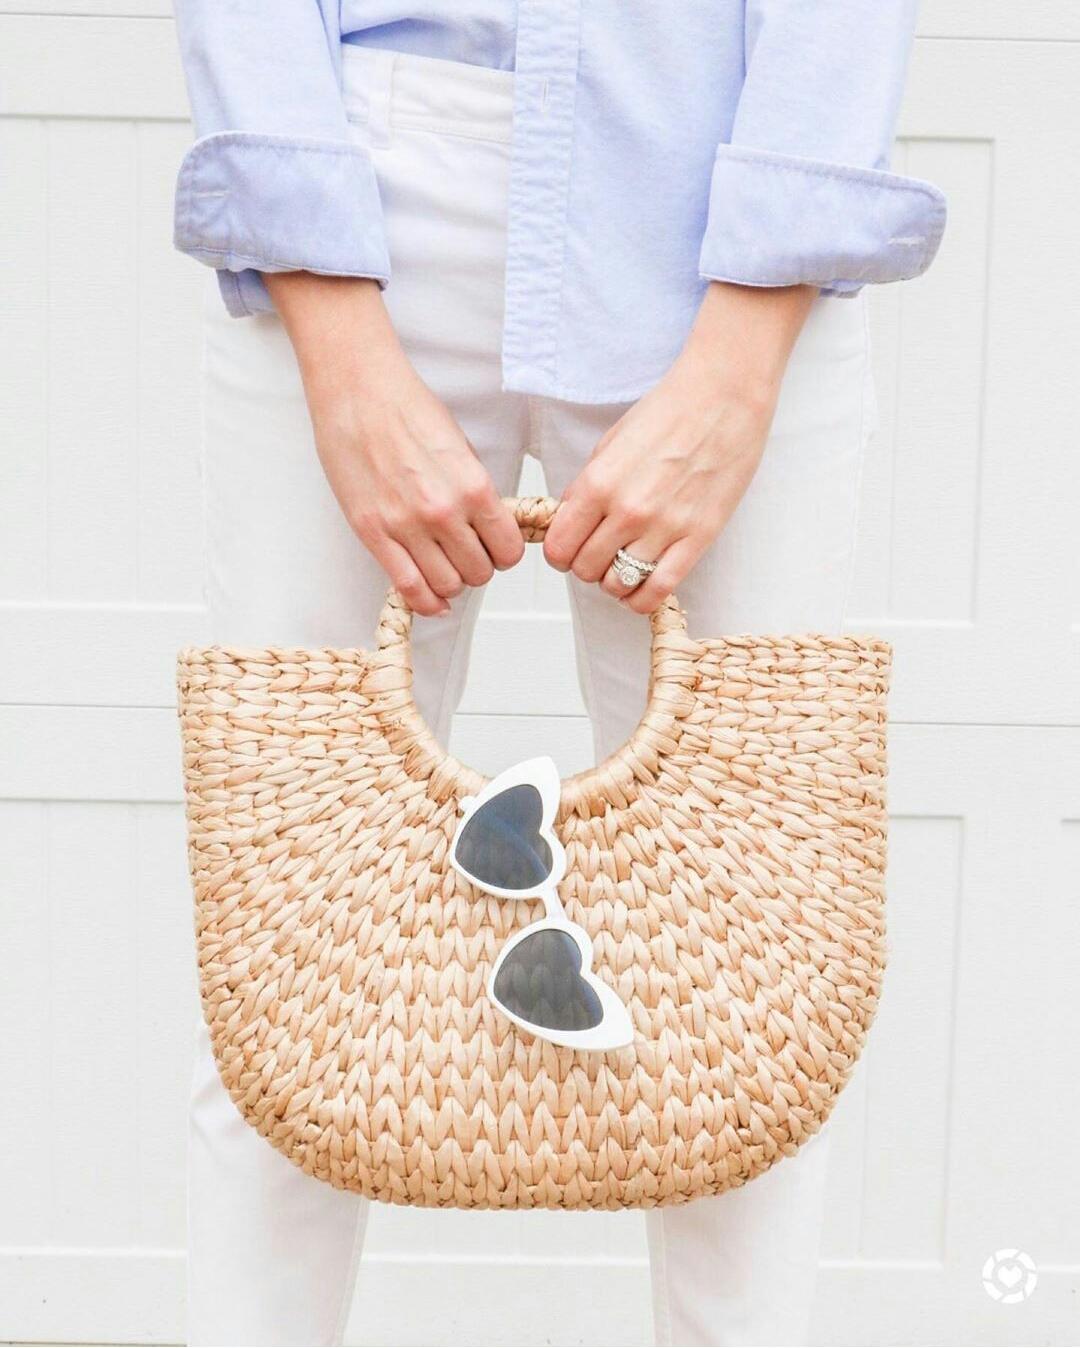 straw bag and sunglasses